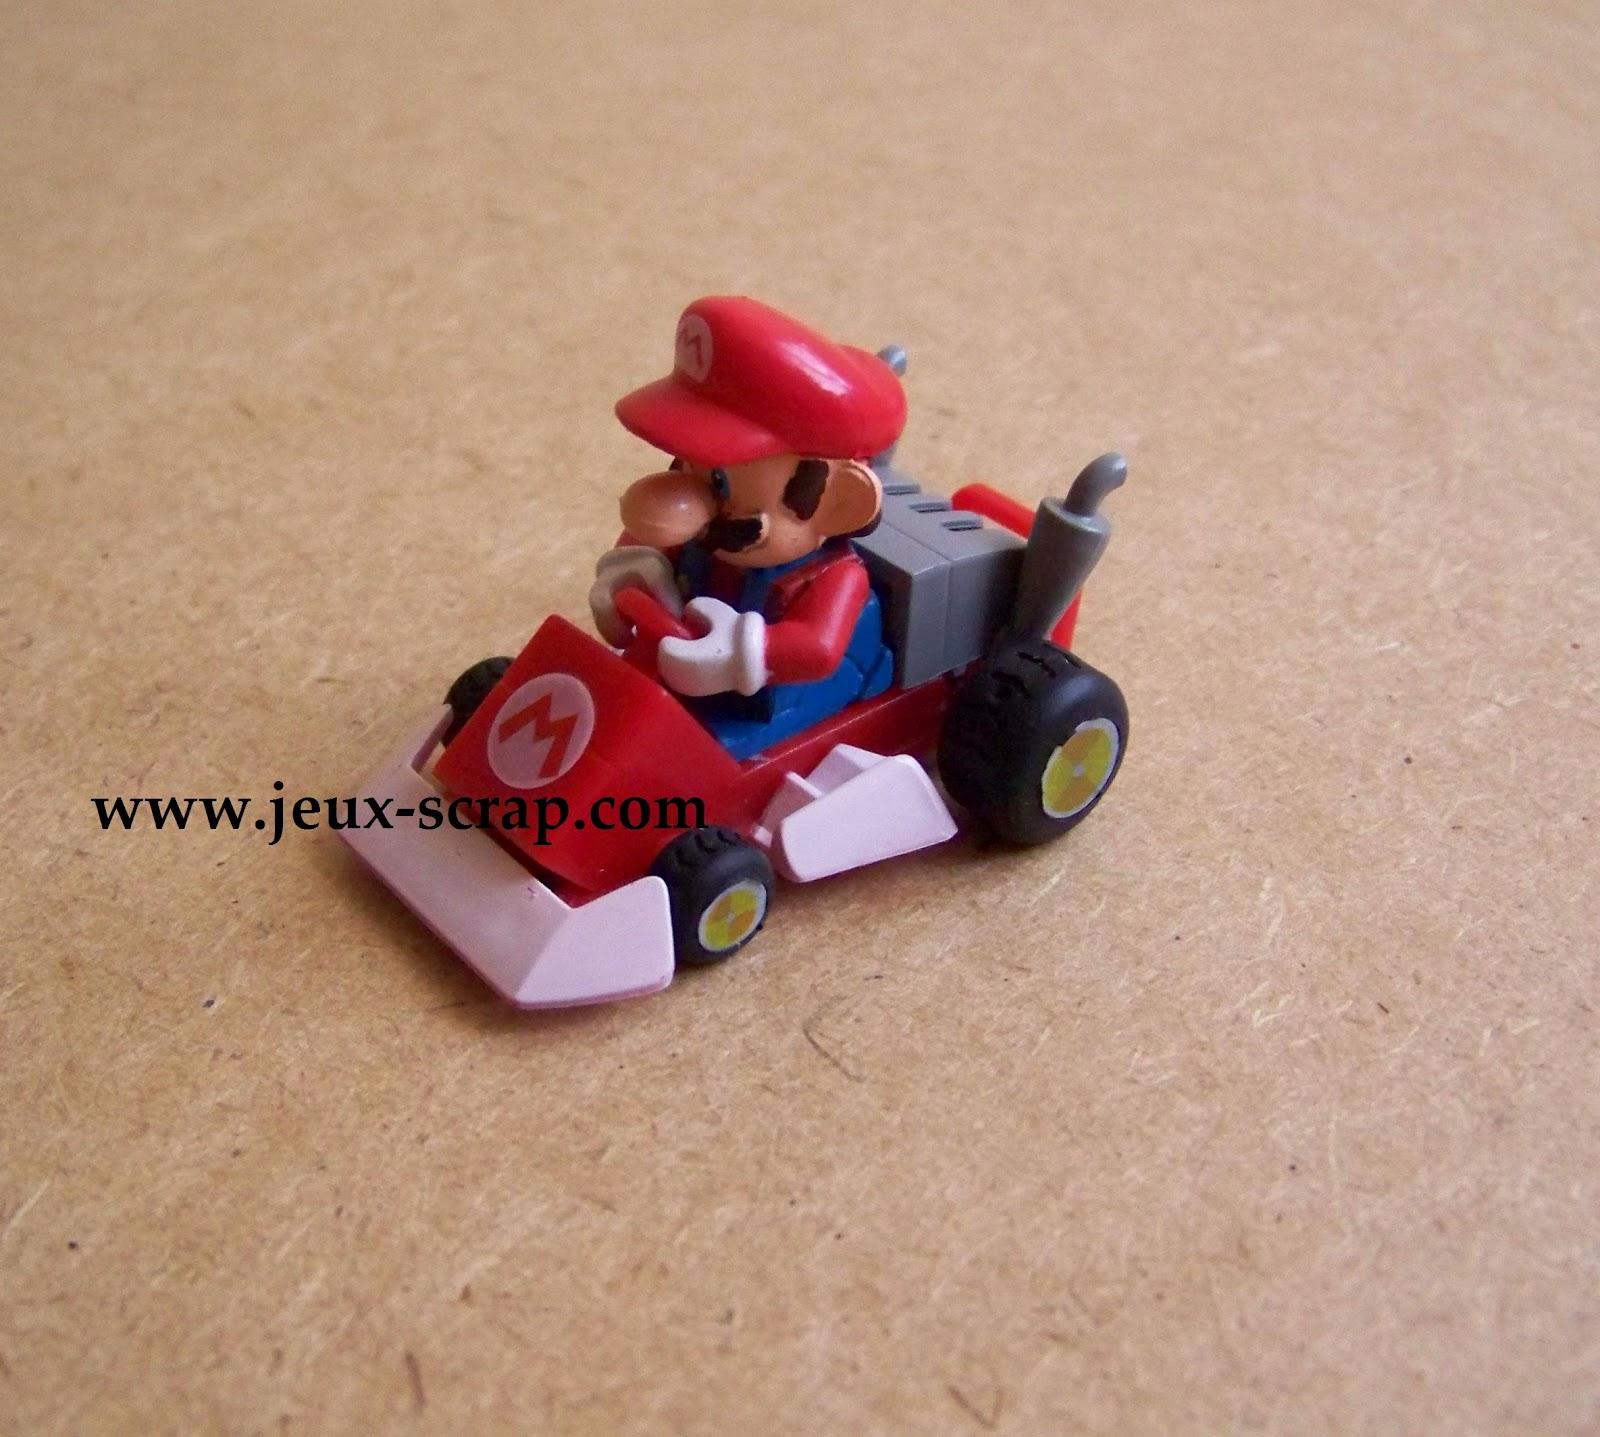 blog boutique jouets jeux scrap mario kart. Black Bedroom Furniture Sets. Home Design Ideas